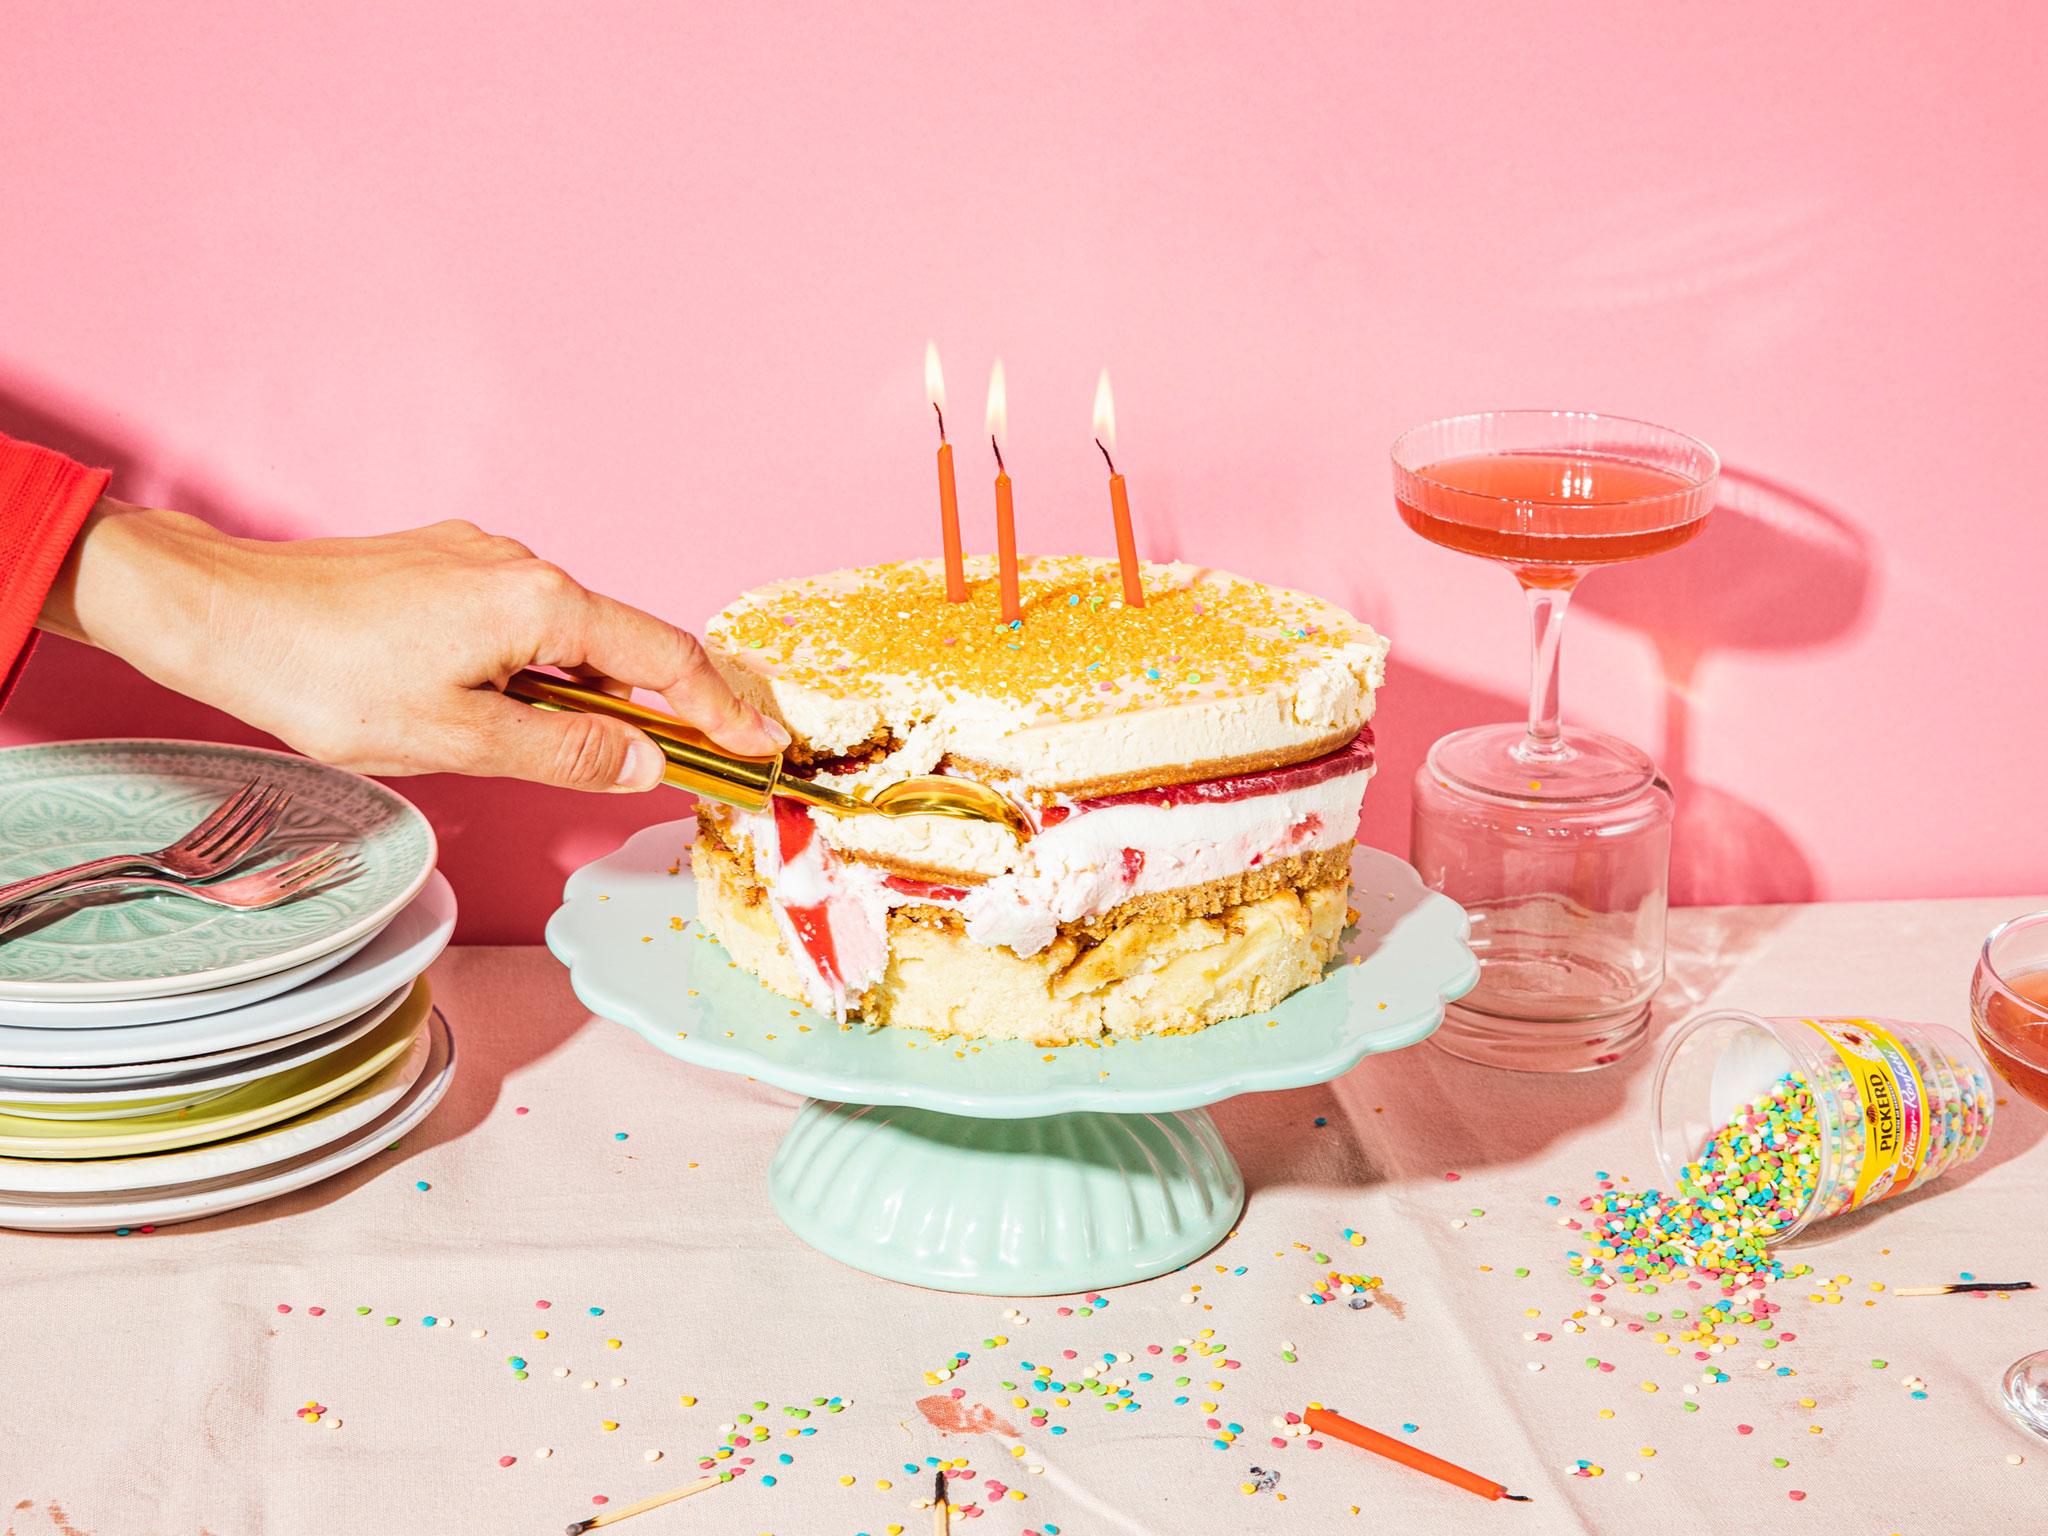 Phenomenal 22 Spectacular Birthday Cake Recipes Kitchen Stories Funny Birthday Cards Online Alyptdamsfinfo